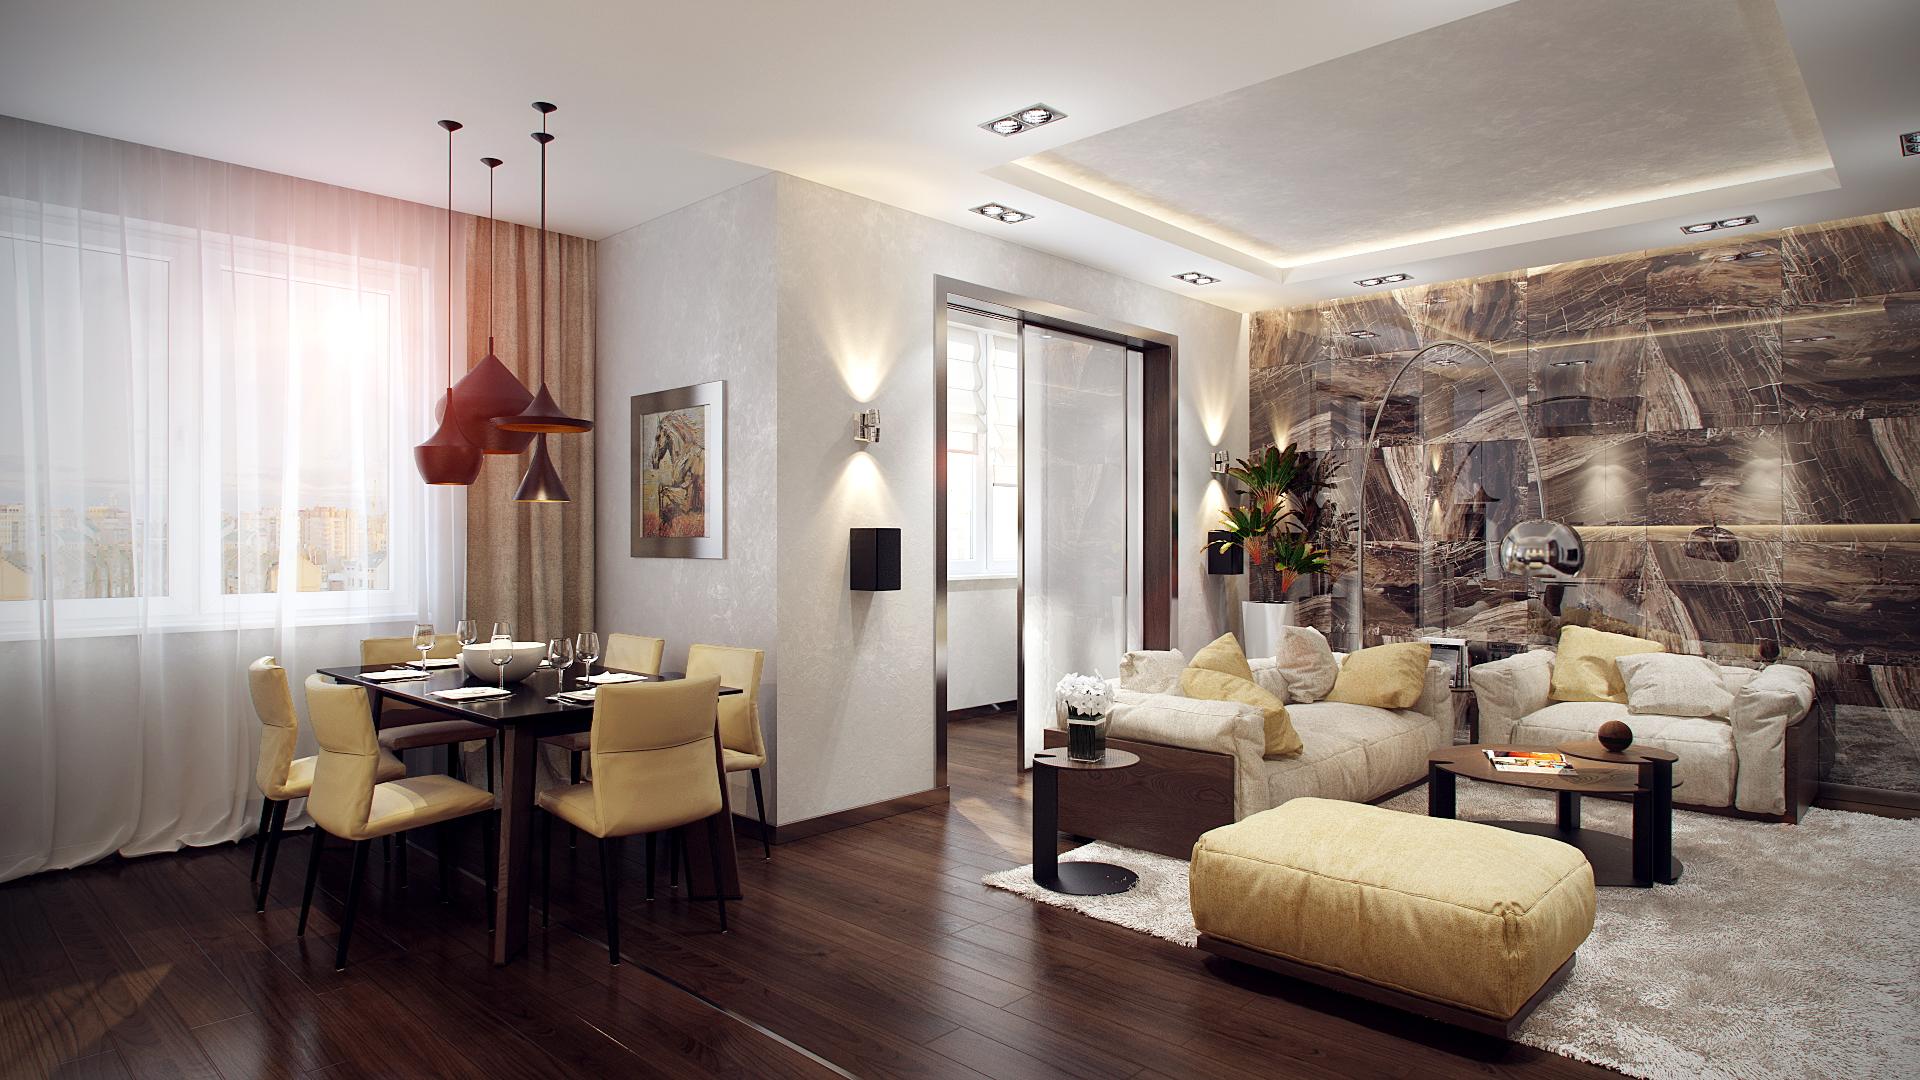 Грамотный дизайн квартиры